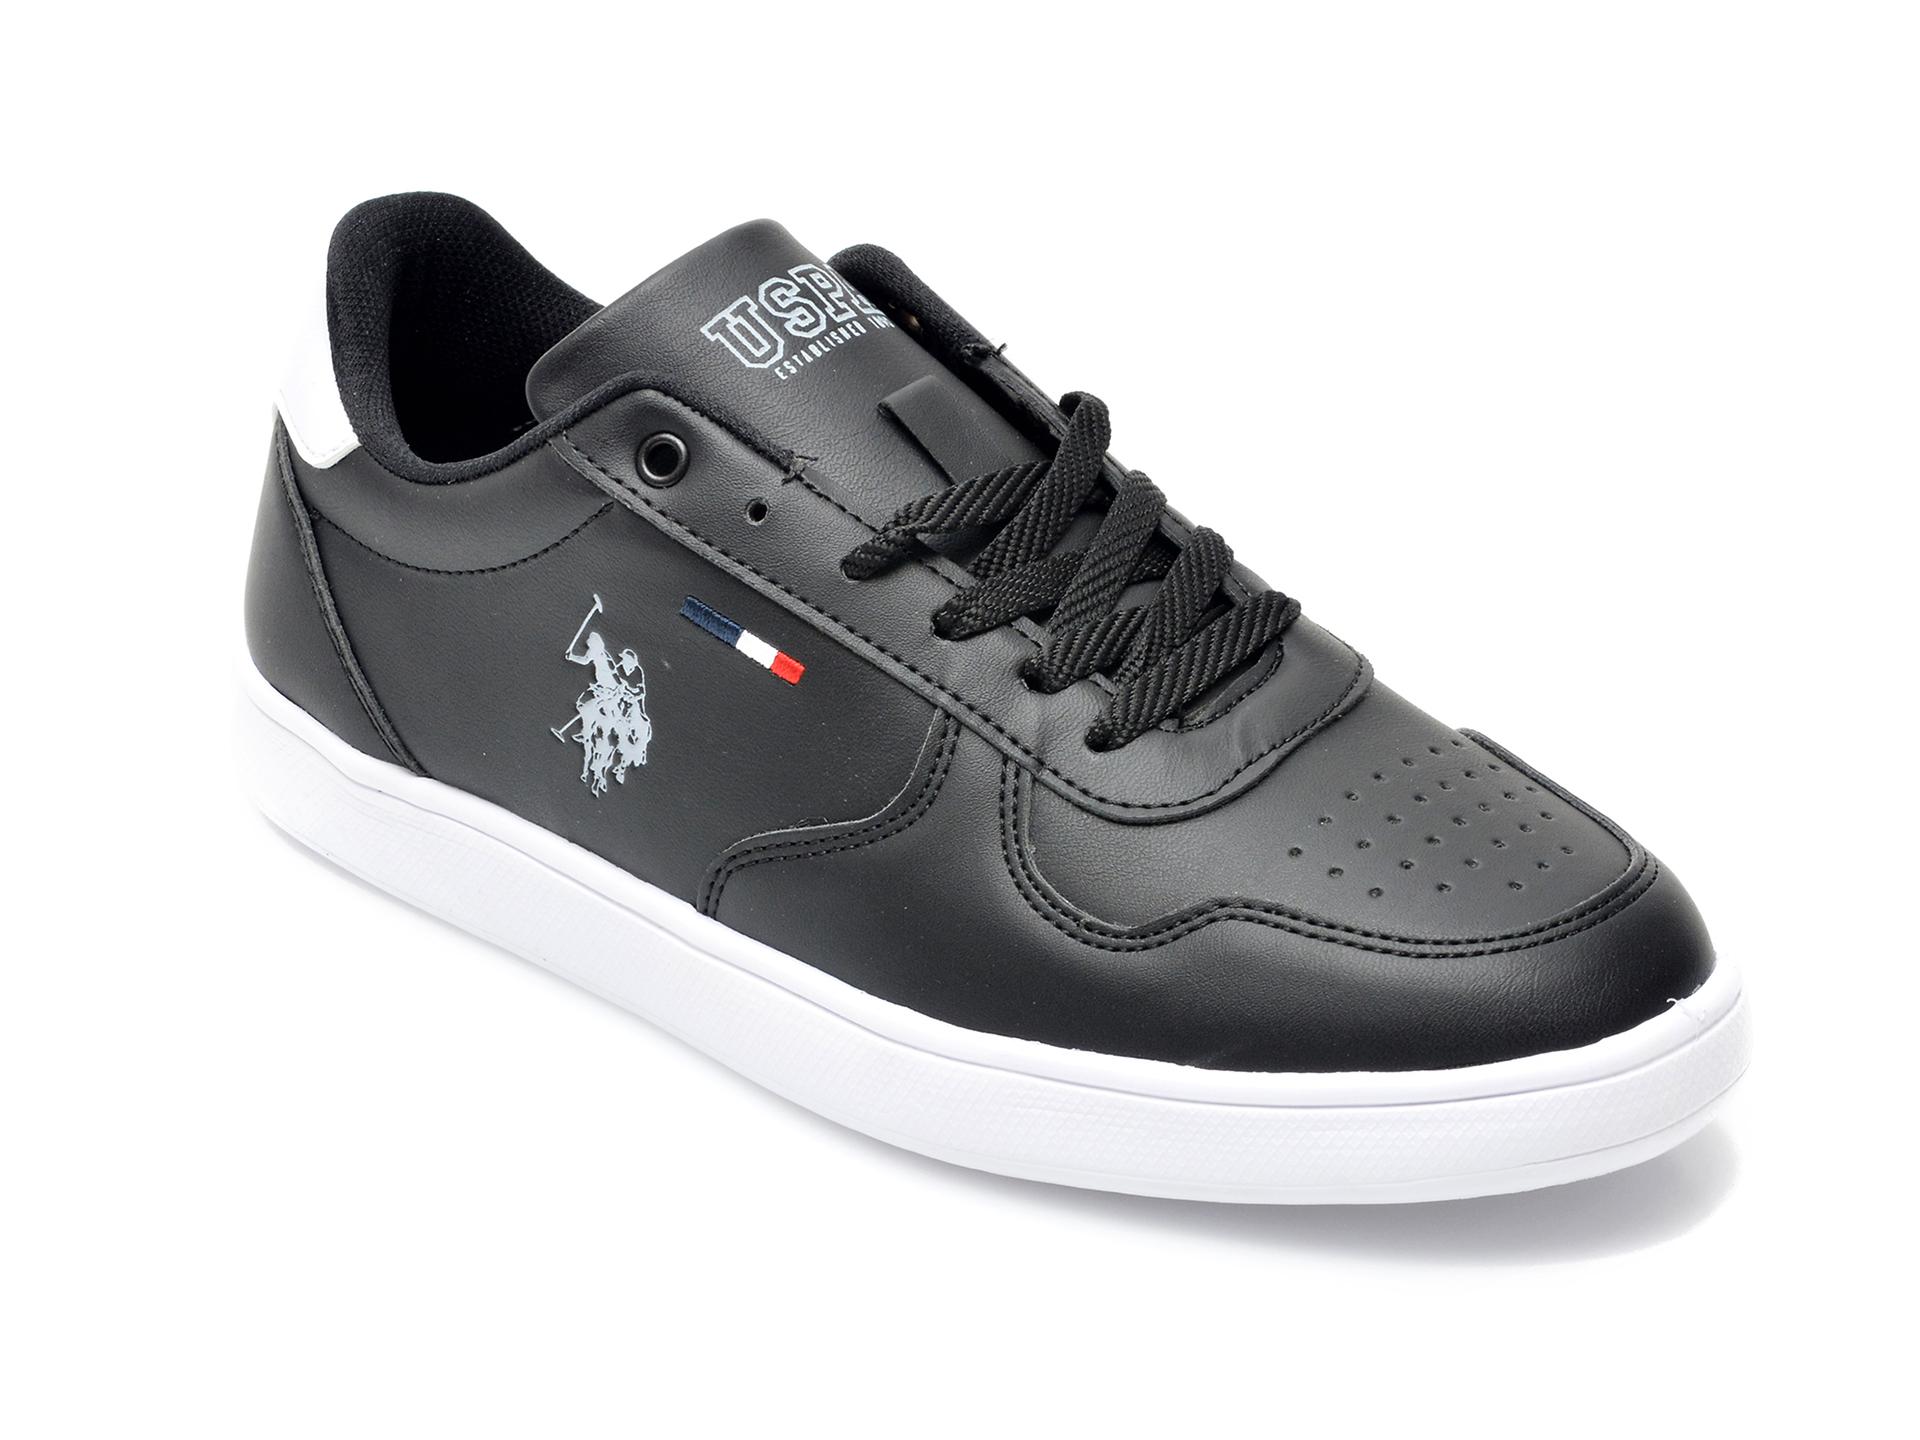 Pantofi Sport Us Polo Assn Negri, Thunwmn, Din Piele Ecologica